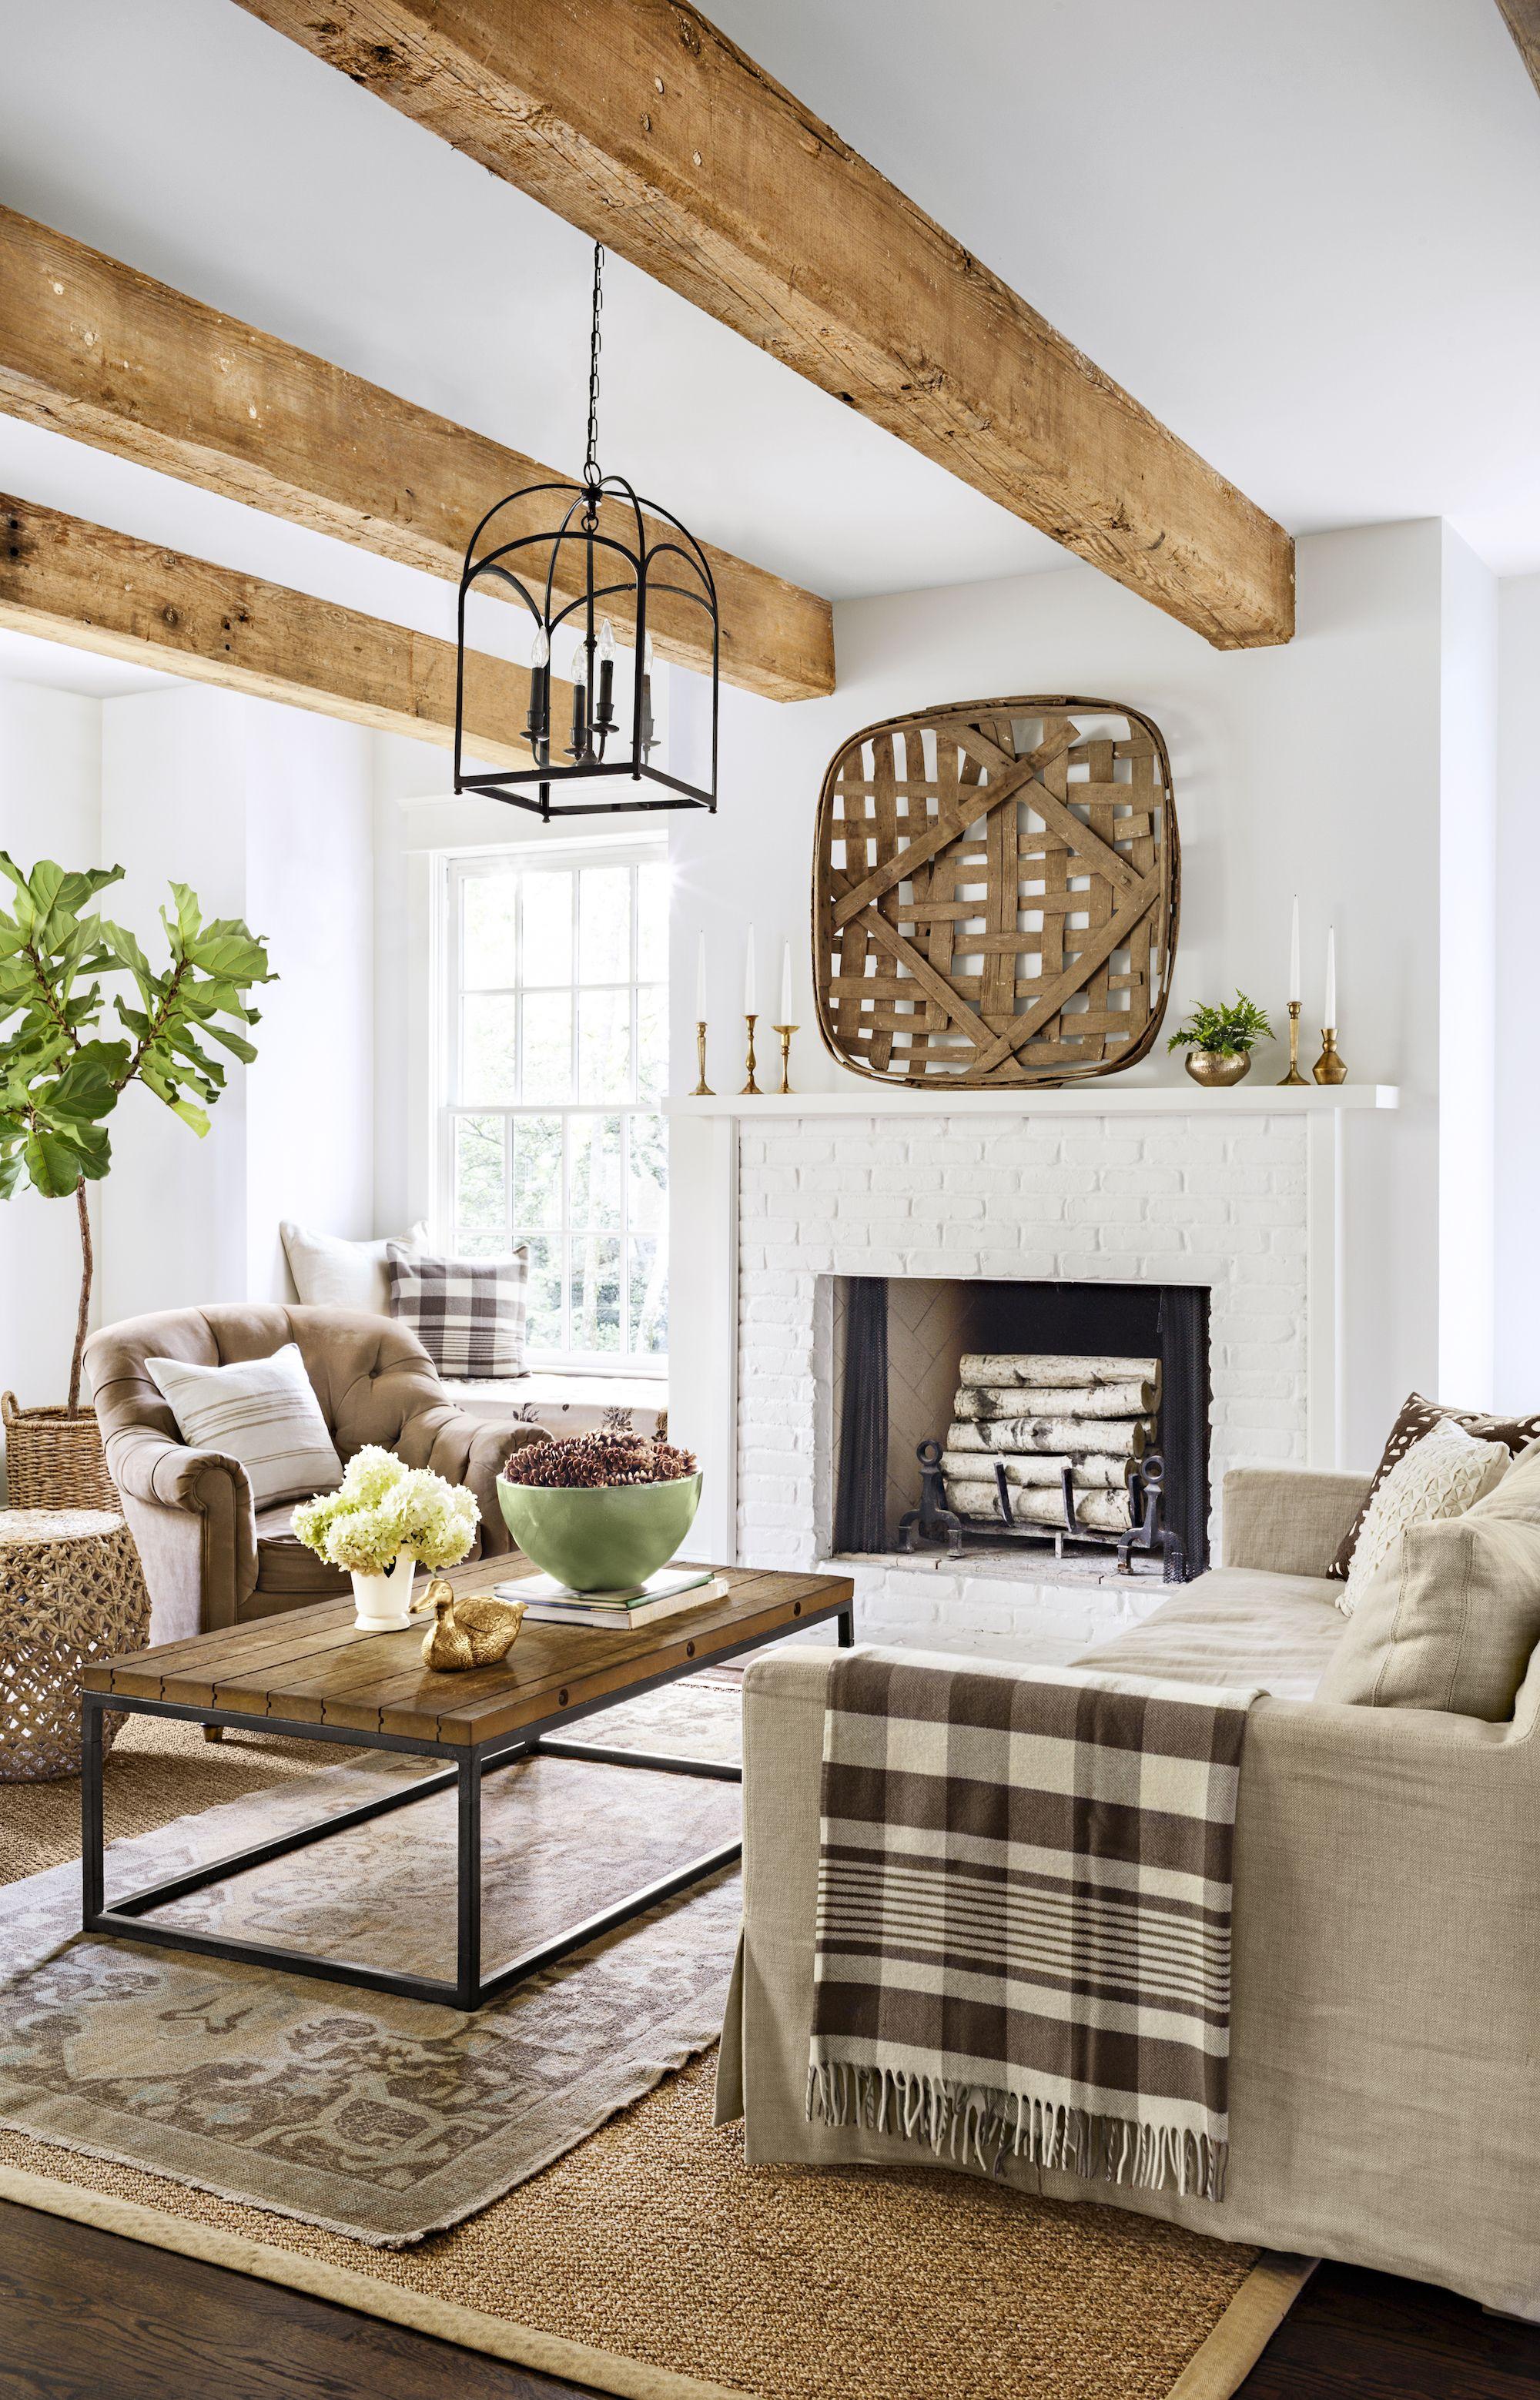 20 Fireplace Decorating Ideas Best Fireplace Design